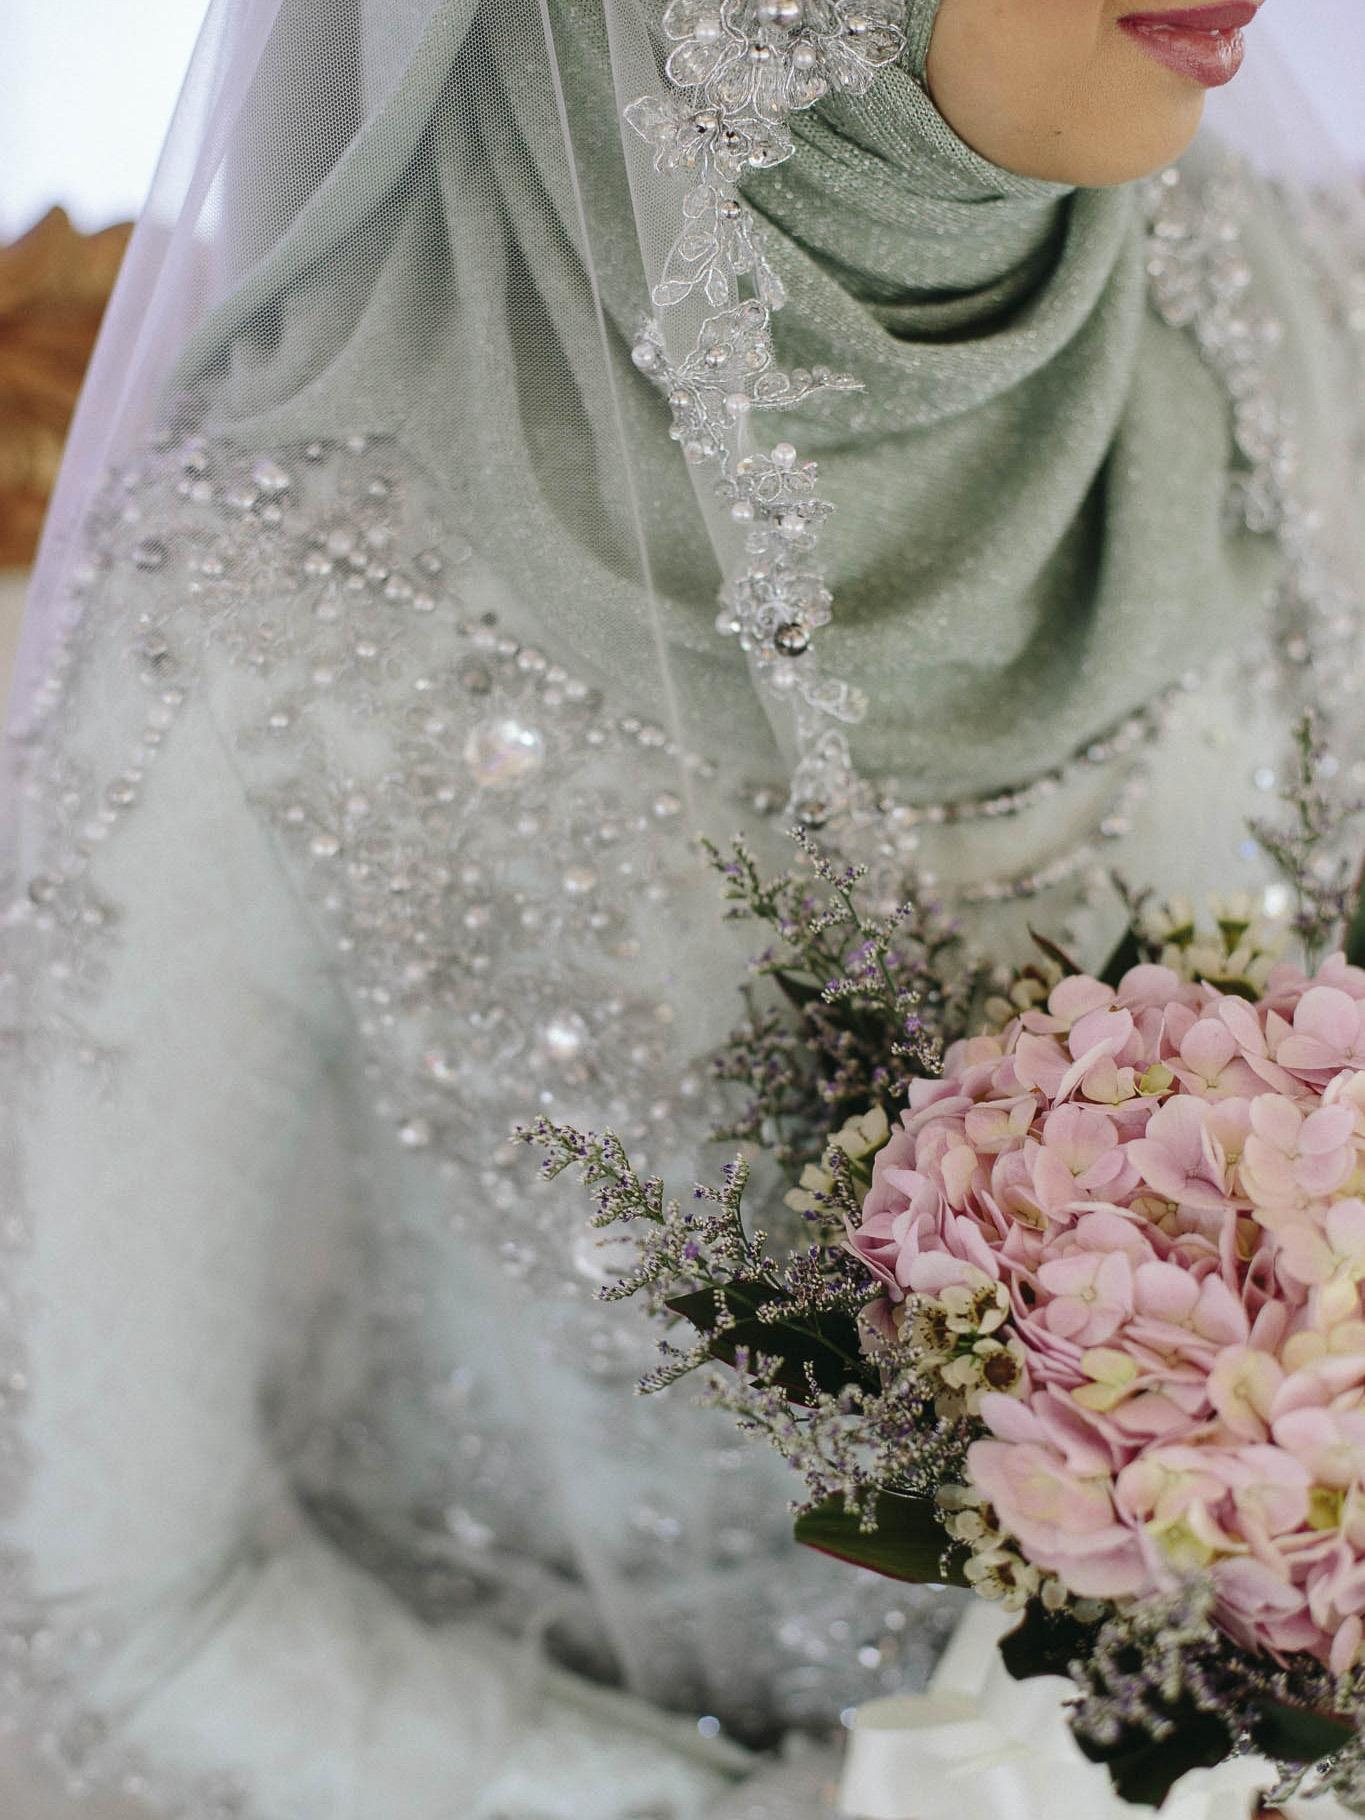 singapore-wedding-photographer-malay-indian-pre-wedding-travel-wmt-2015-57.jpg